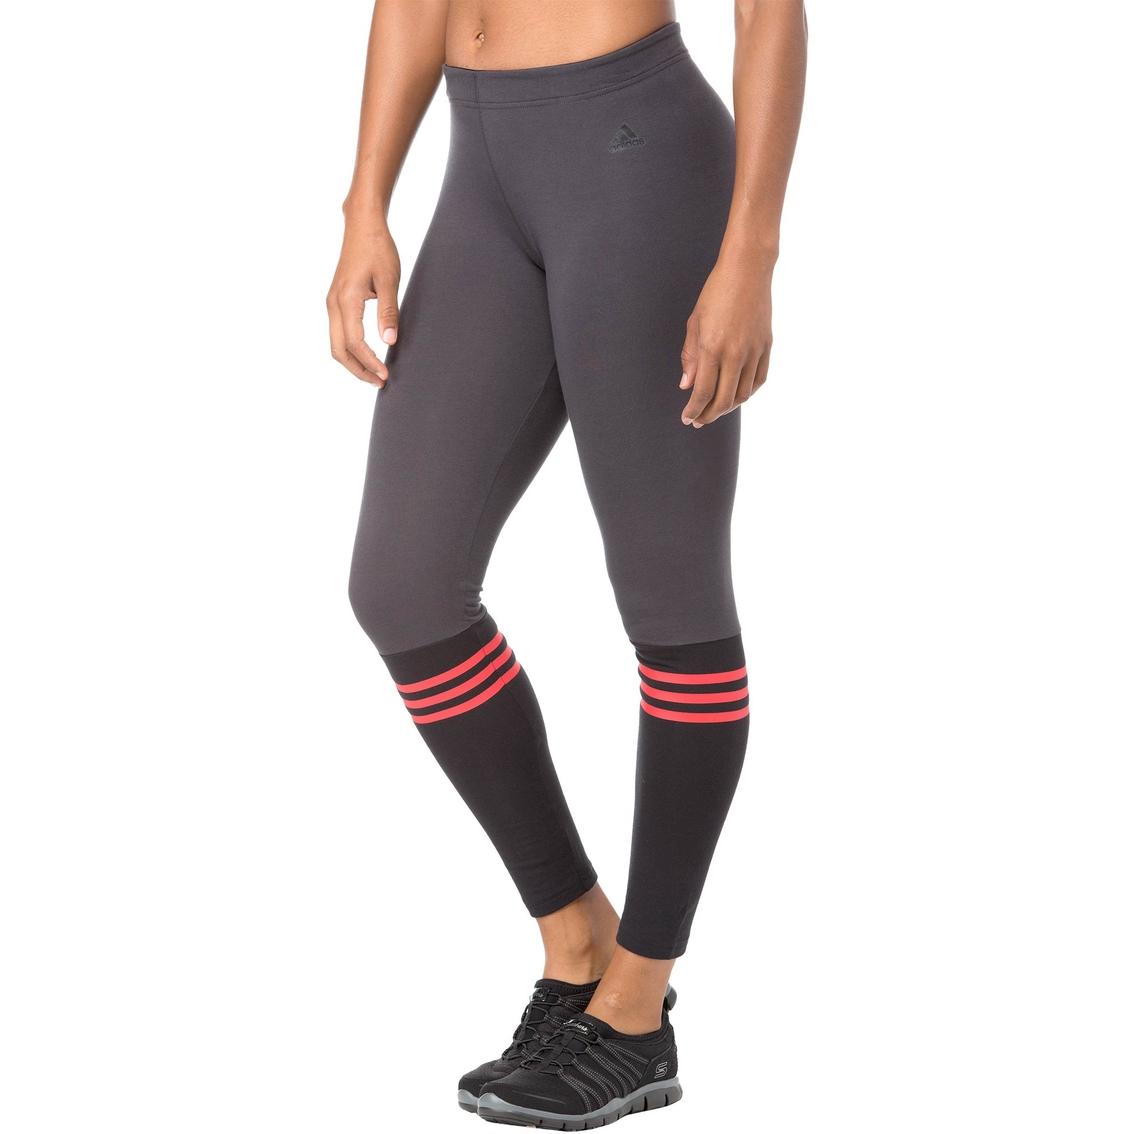 0359caec35449 Adidas 3 Stripes Crew Leggings   Pants & Capris   Apparel   Shop The ...